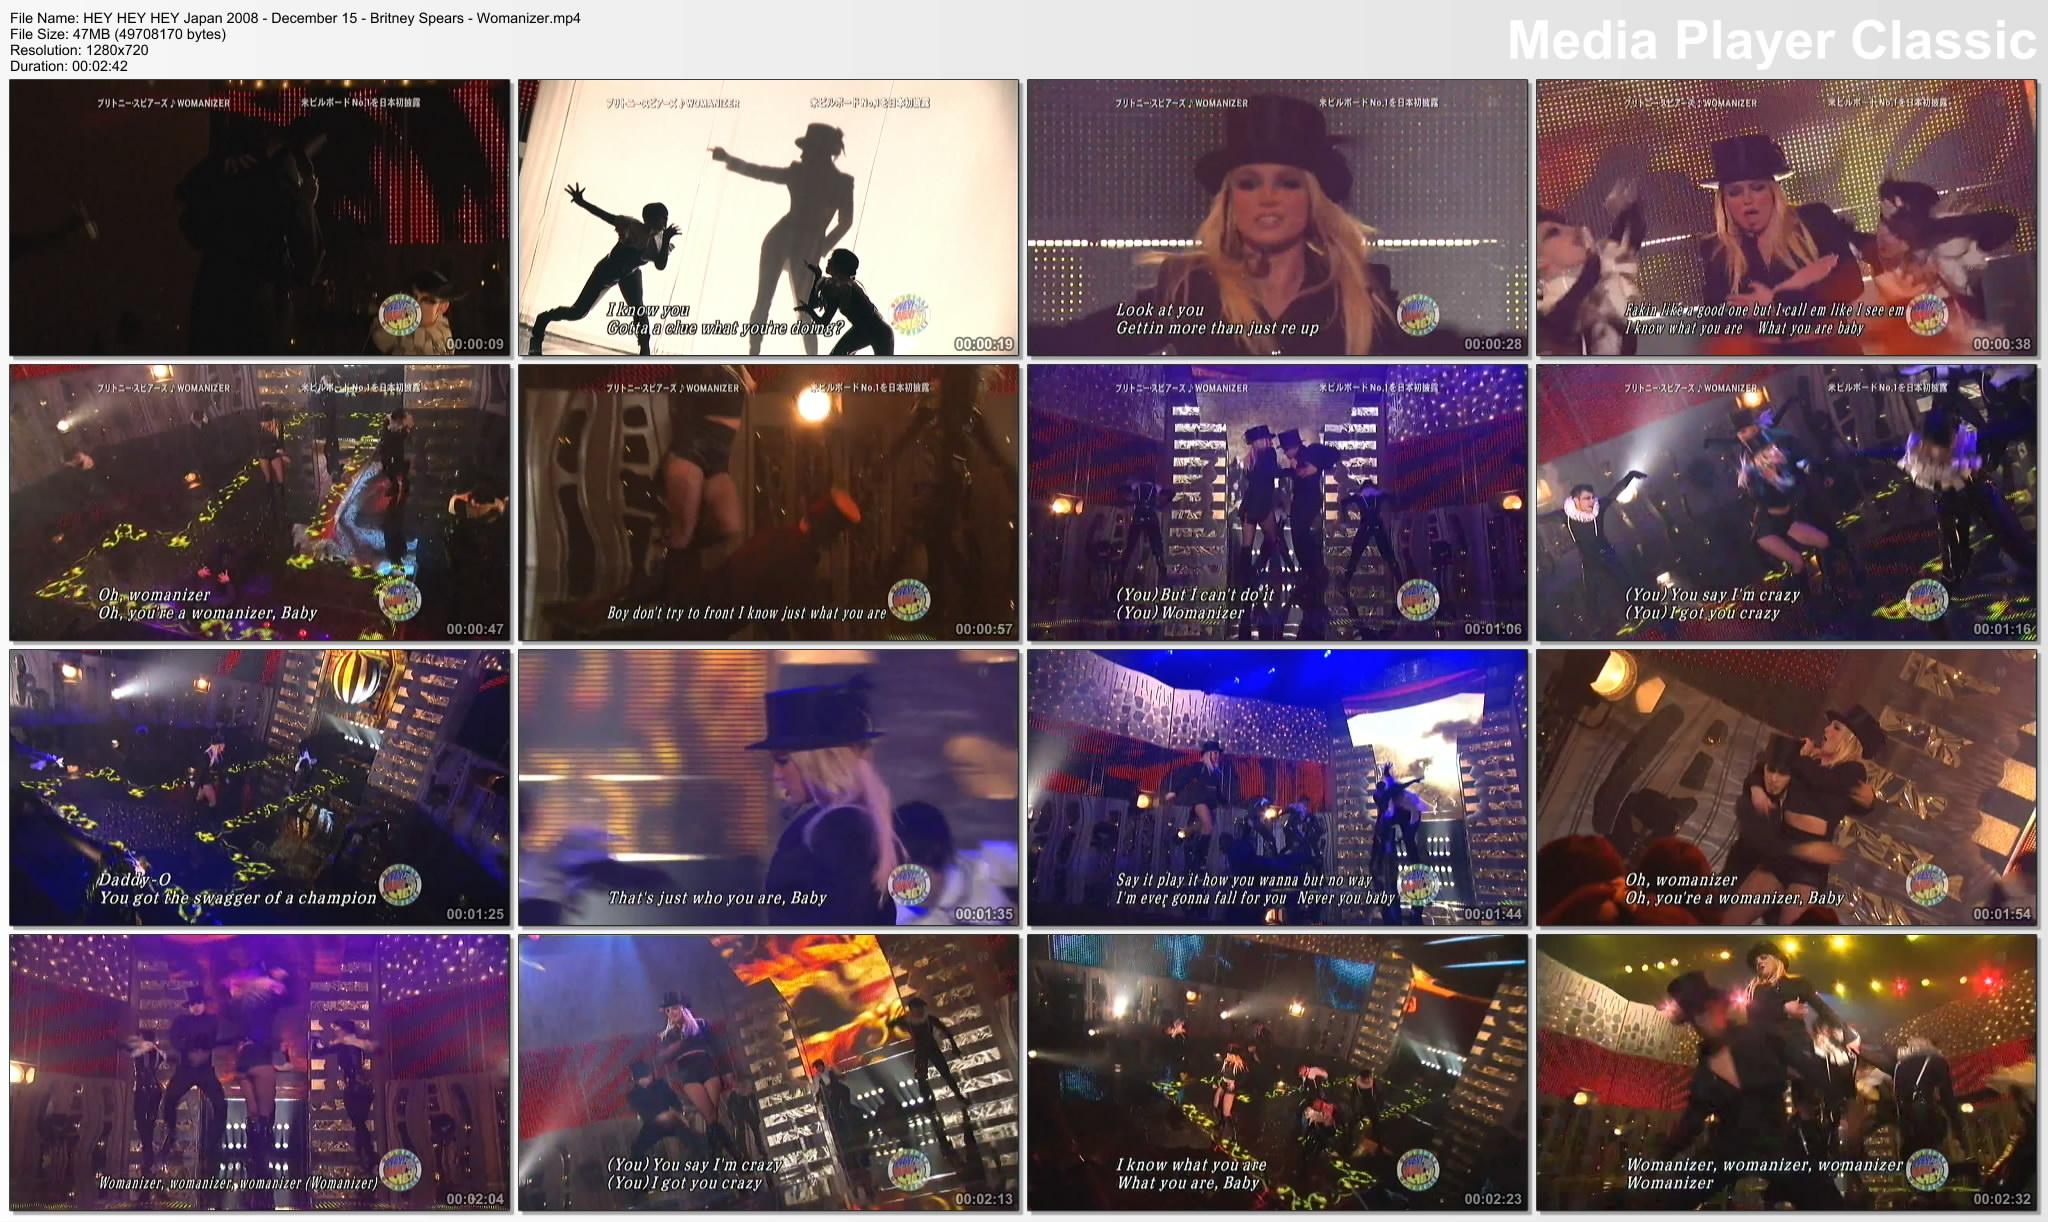 777437325_HEYHEYHEYJapan2008_December15_BritneySpears_Womanizer.mp4_thumbs_2012.04.18_23.18.51_122_93lo.jpg